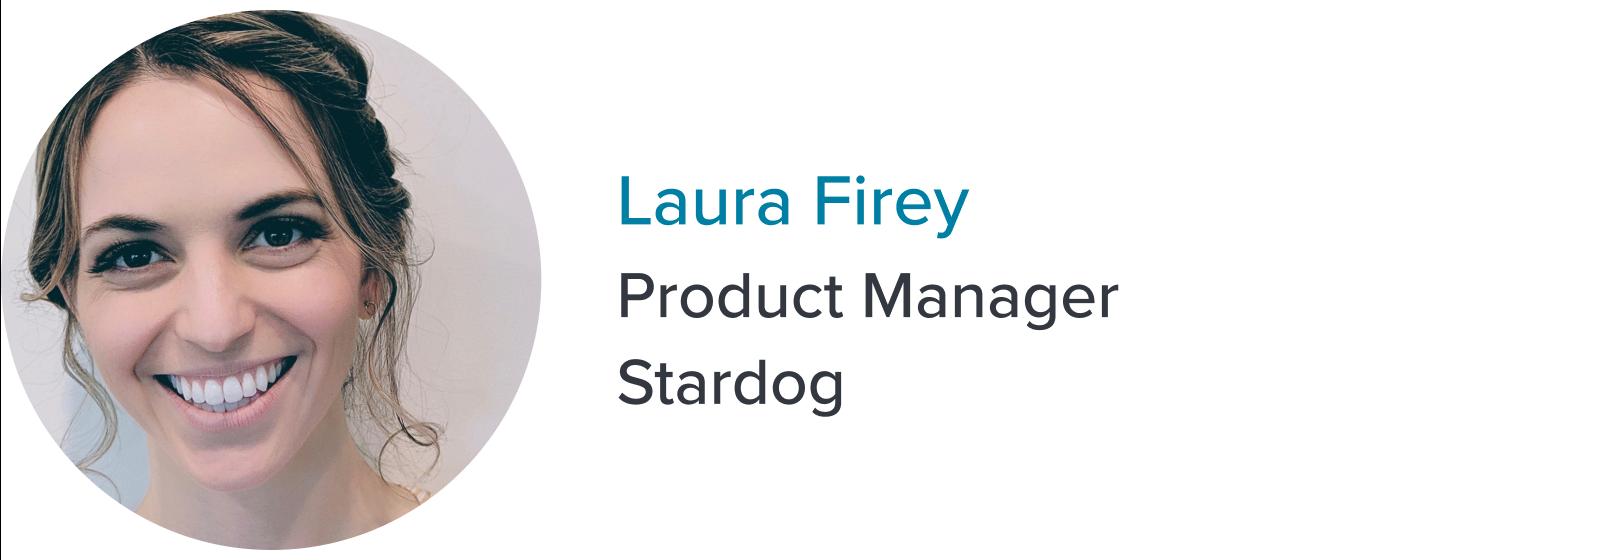 Laura-Firey